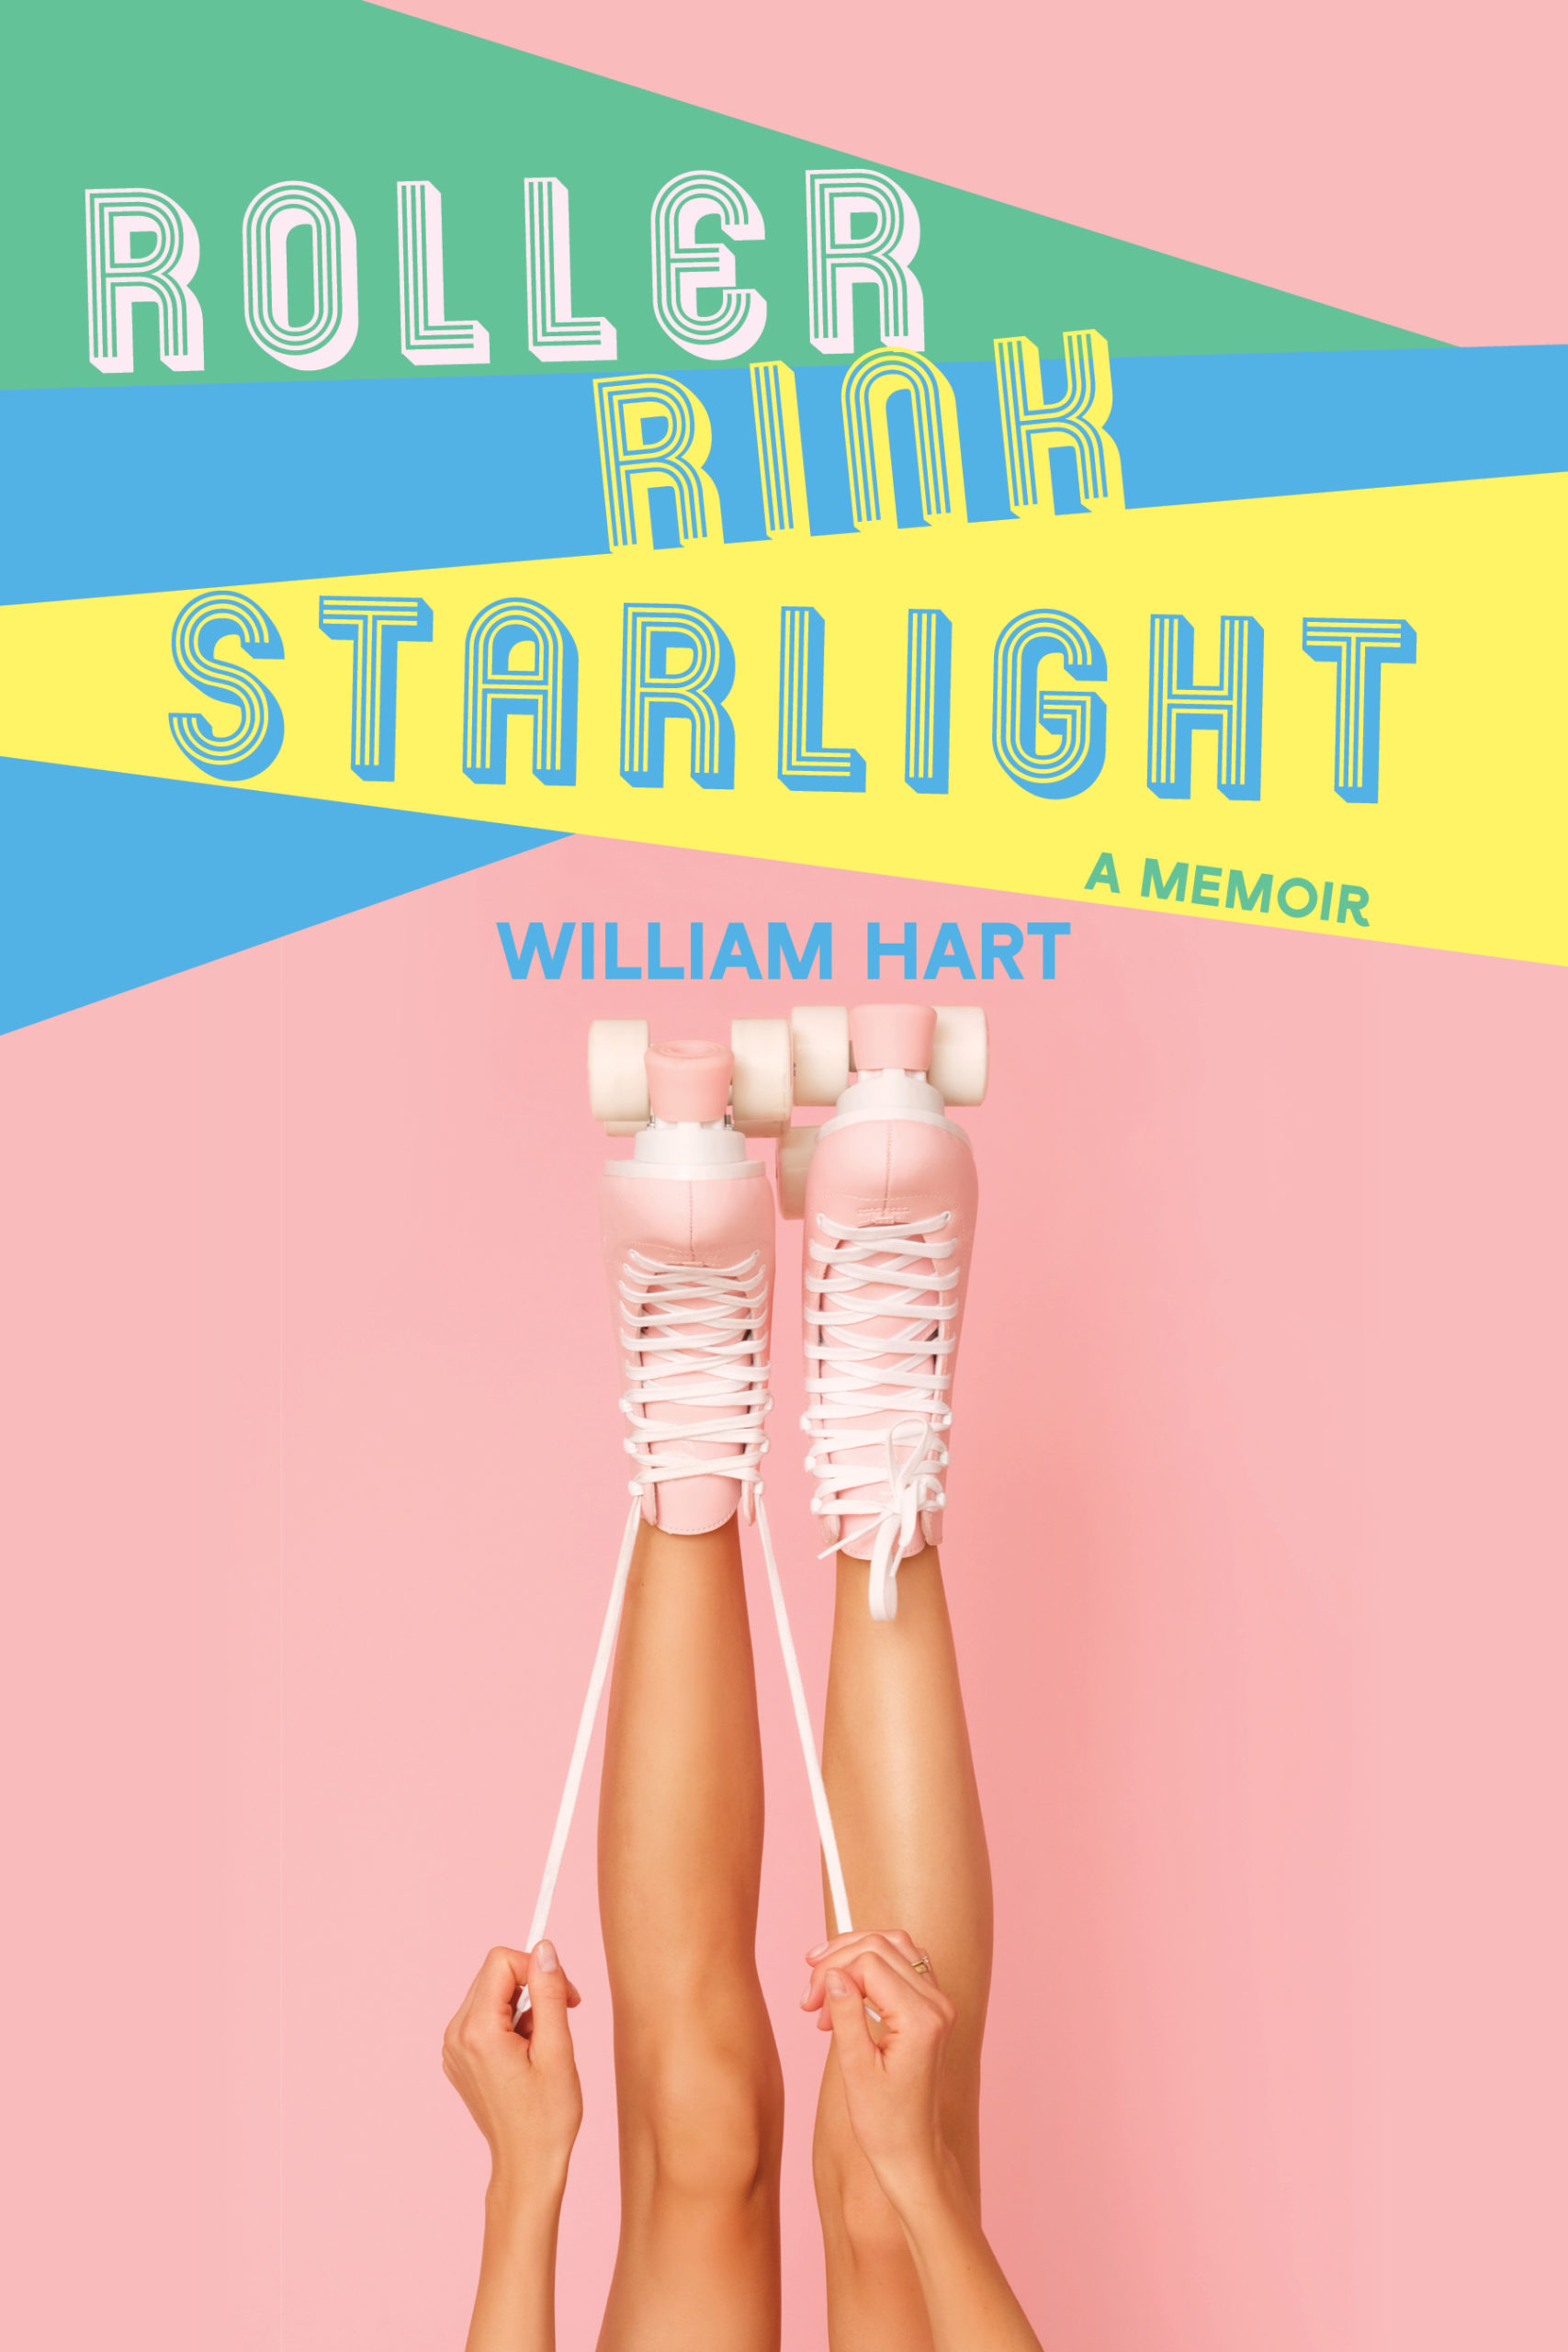 Roller Rink Starlight: A Memoir